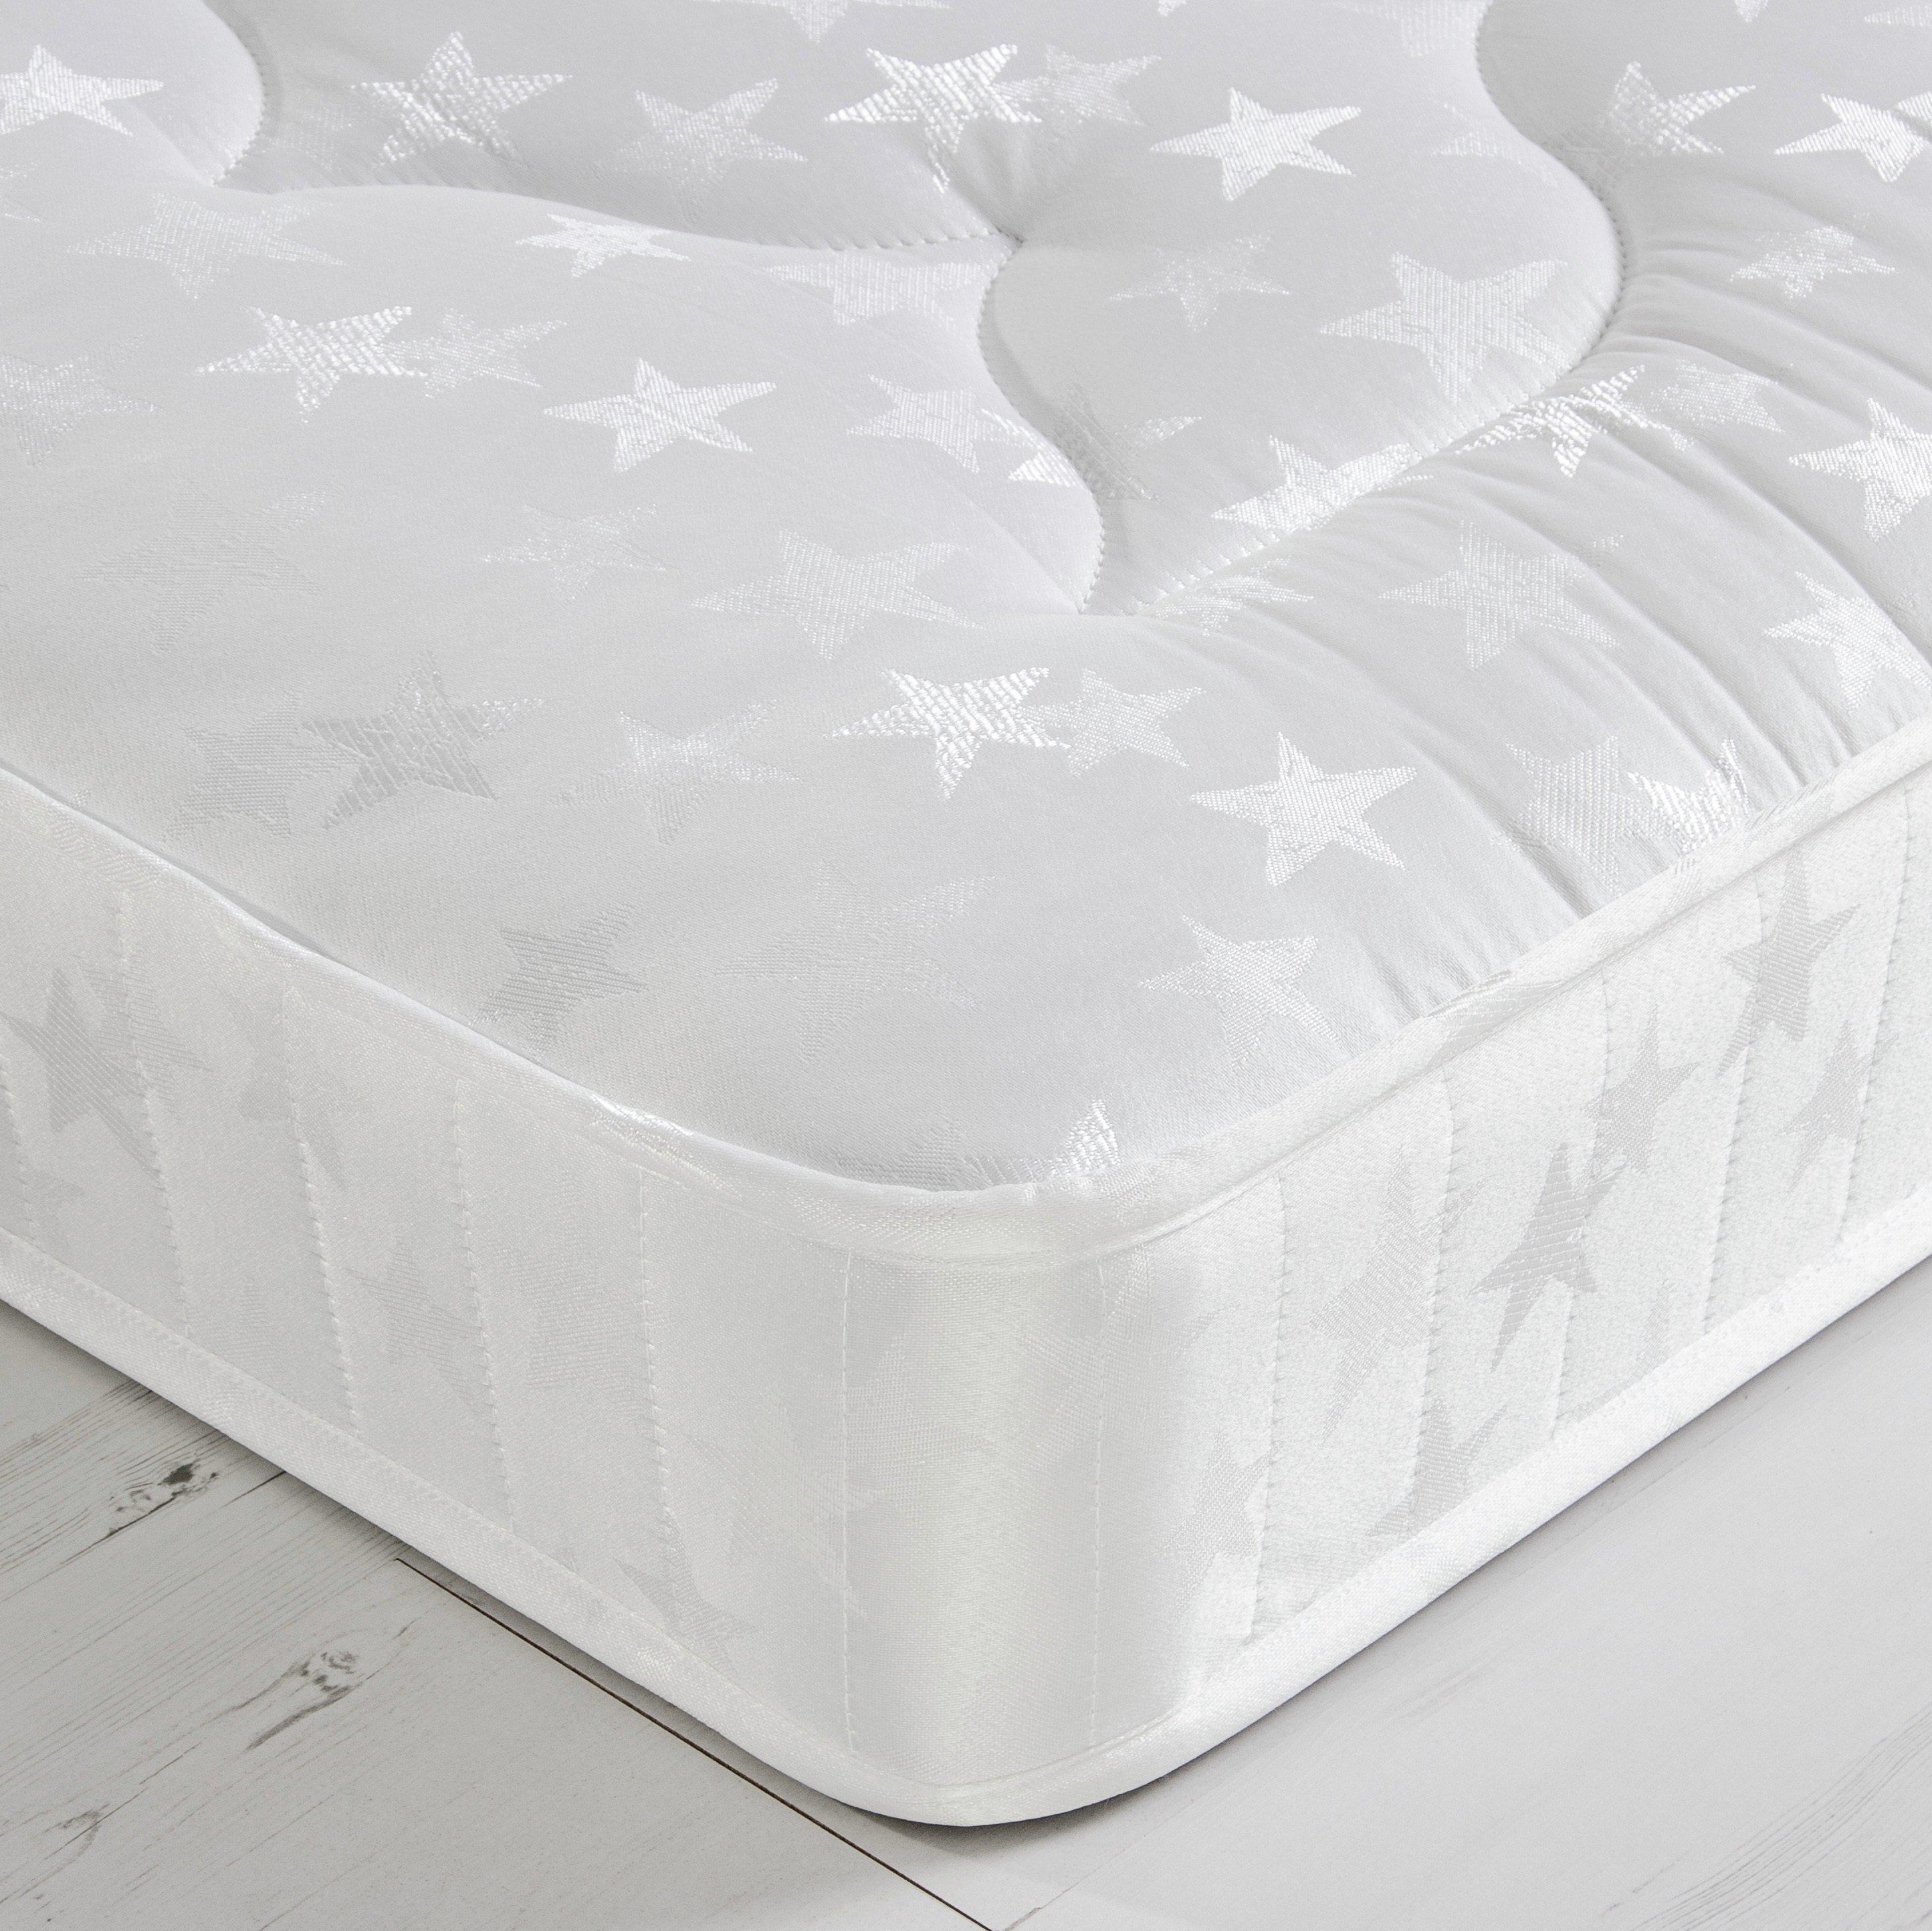 Image of Airsprung - New Elliott Comfort - Single Mattress - White